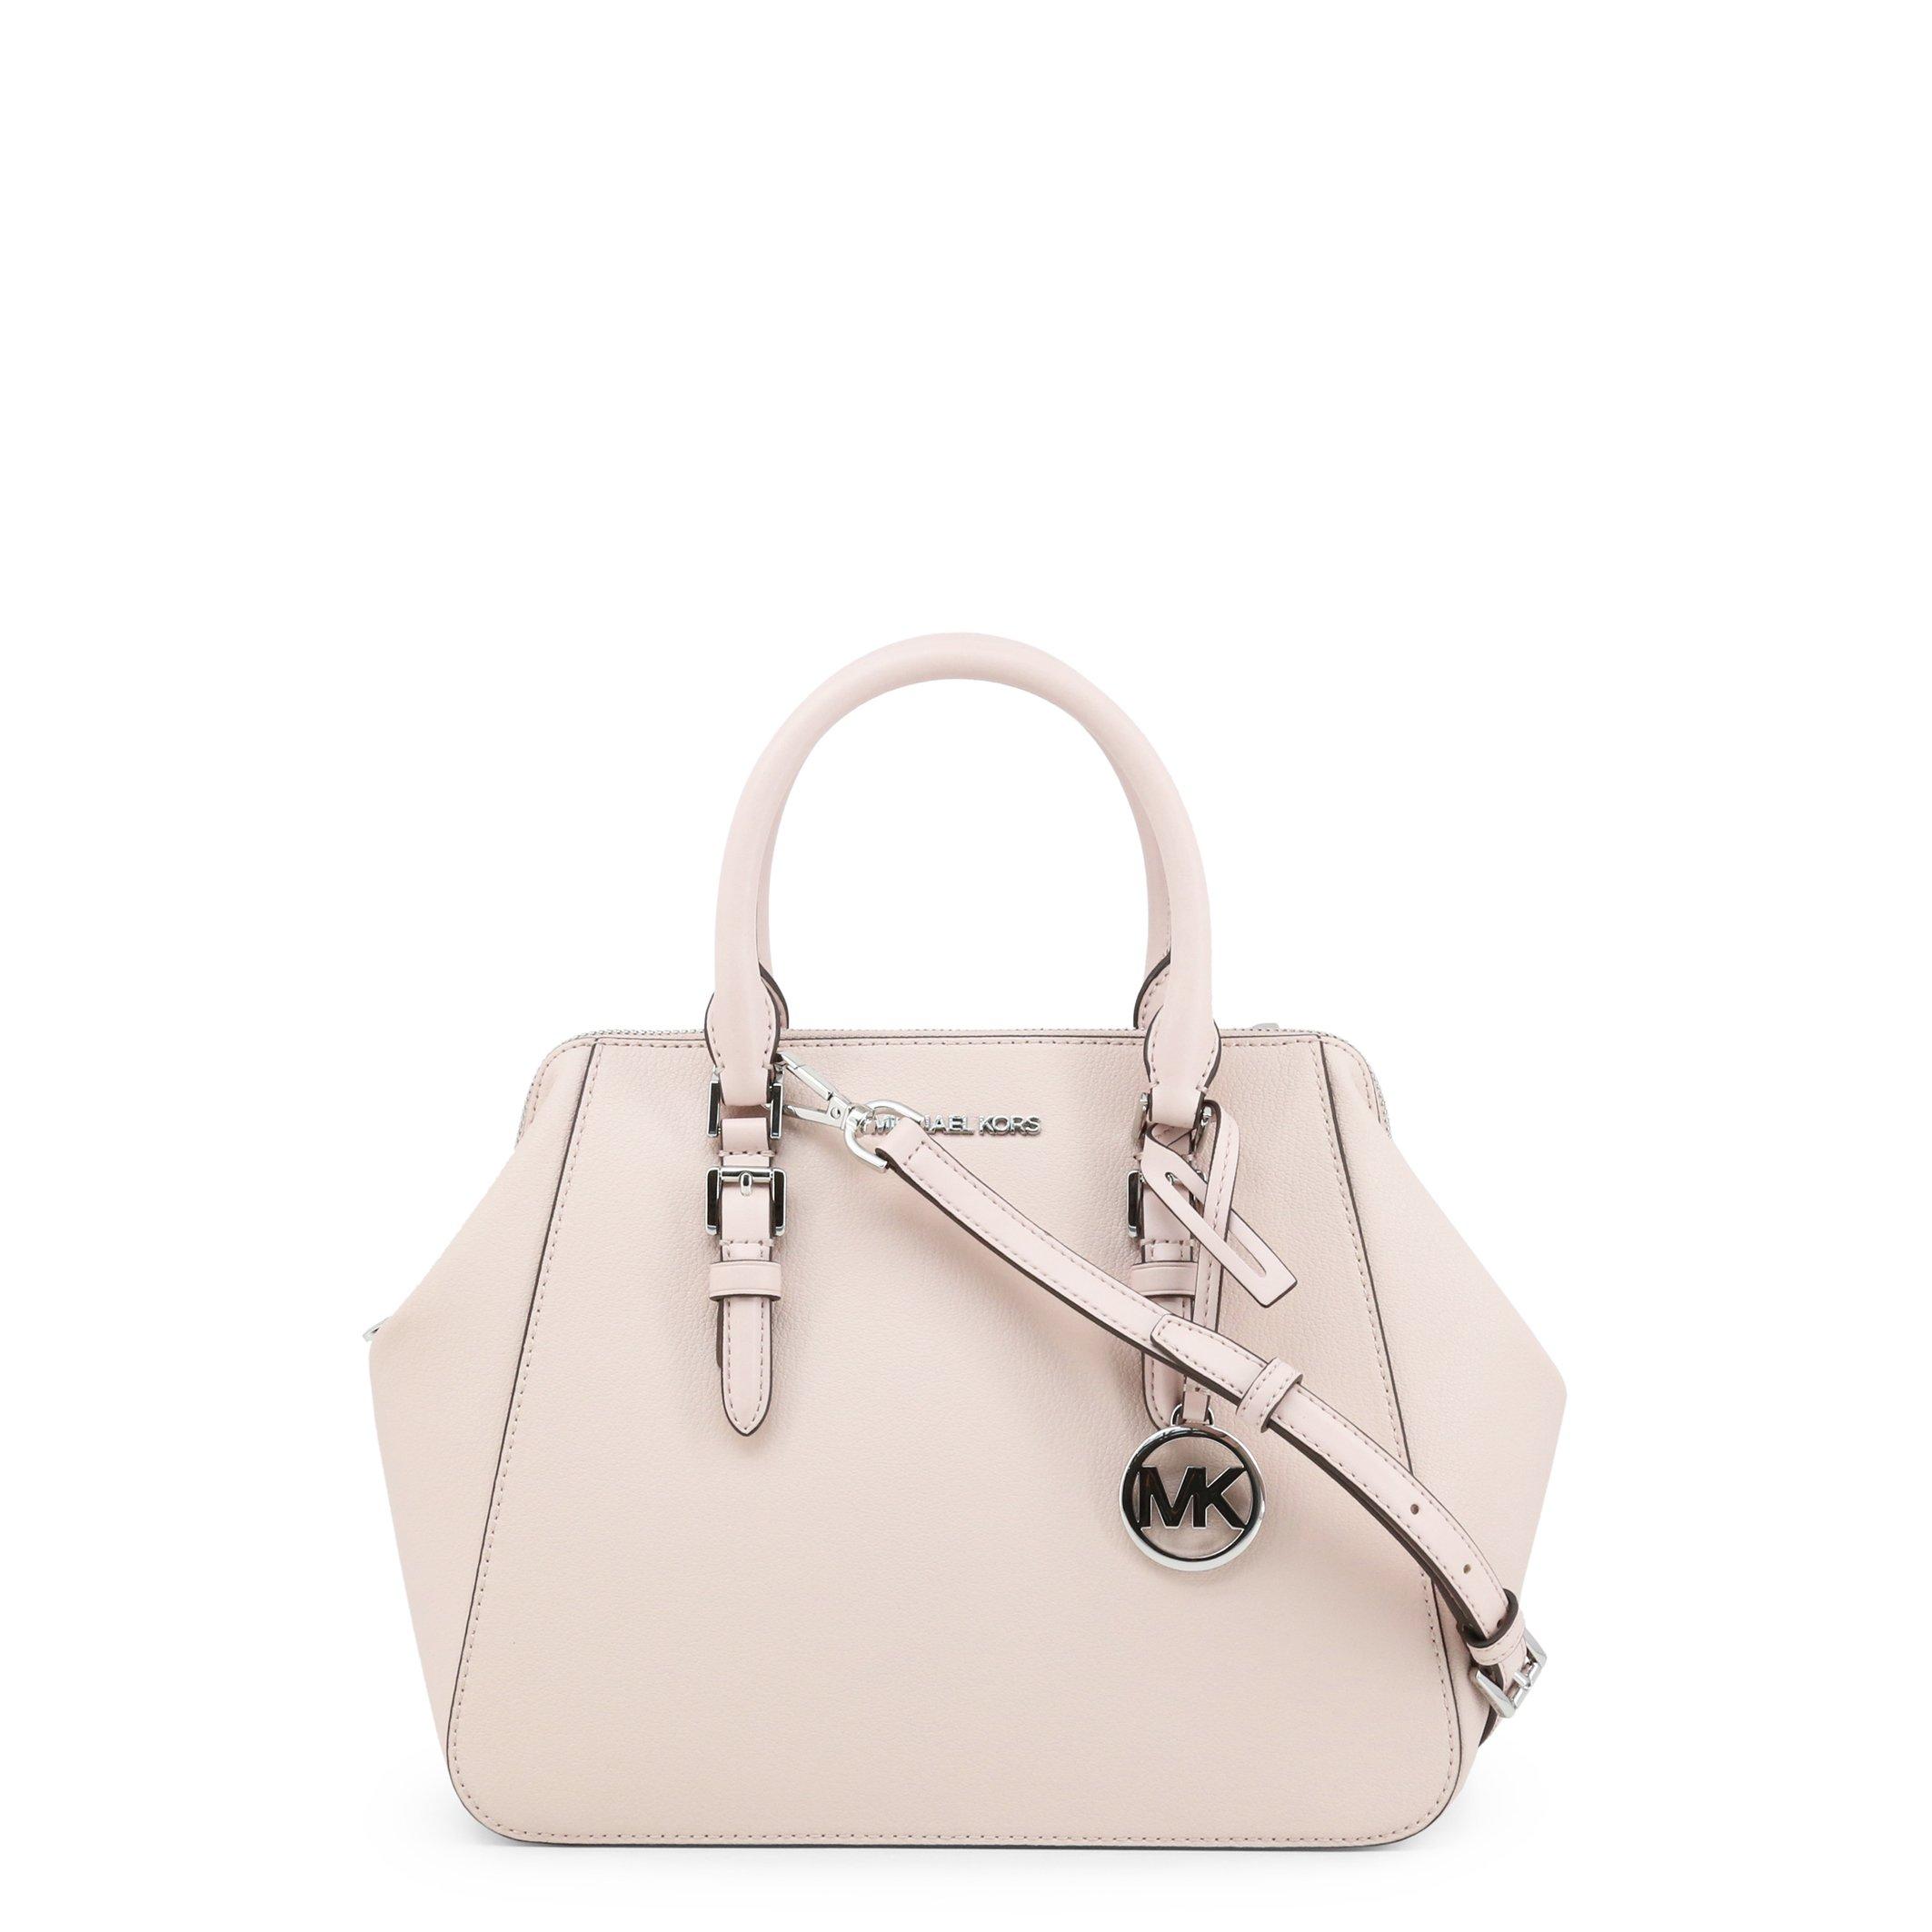 Michael Kors Women's Handbag Various Colours 325379 - pink NOSIZE